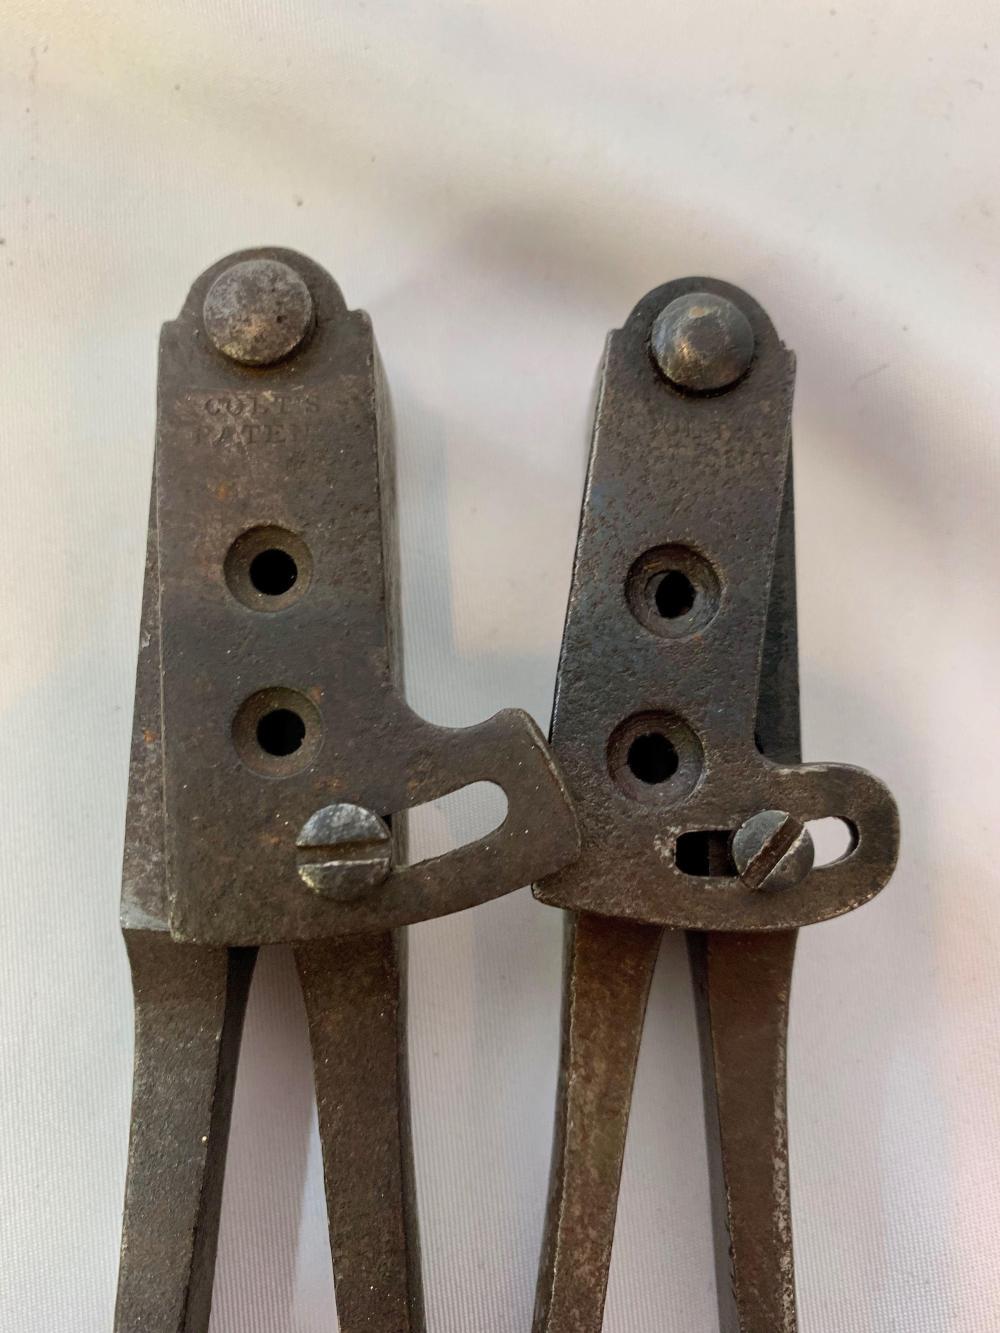 Two Colt Bullet Molds